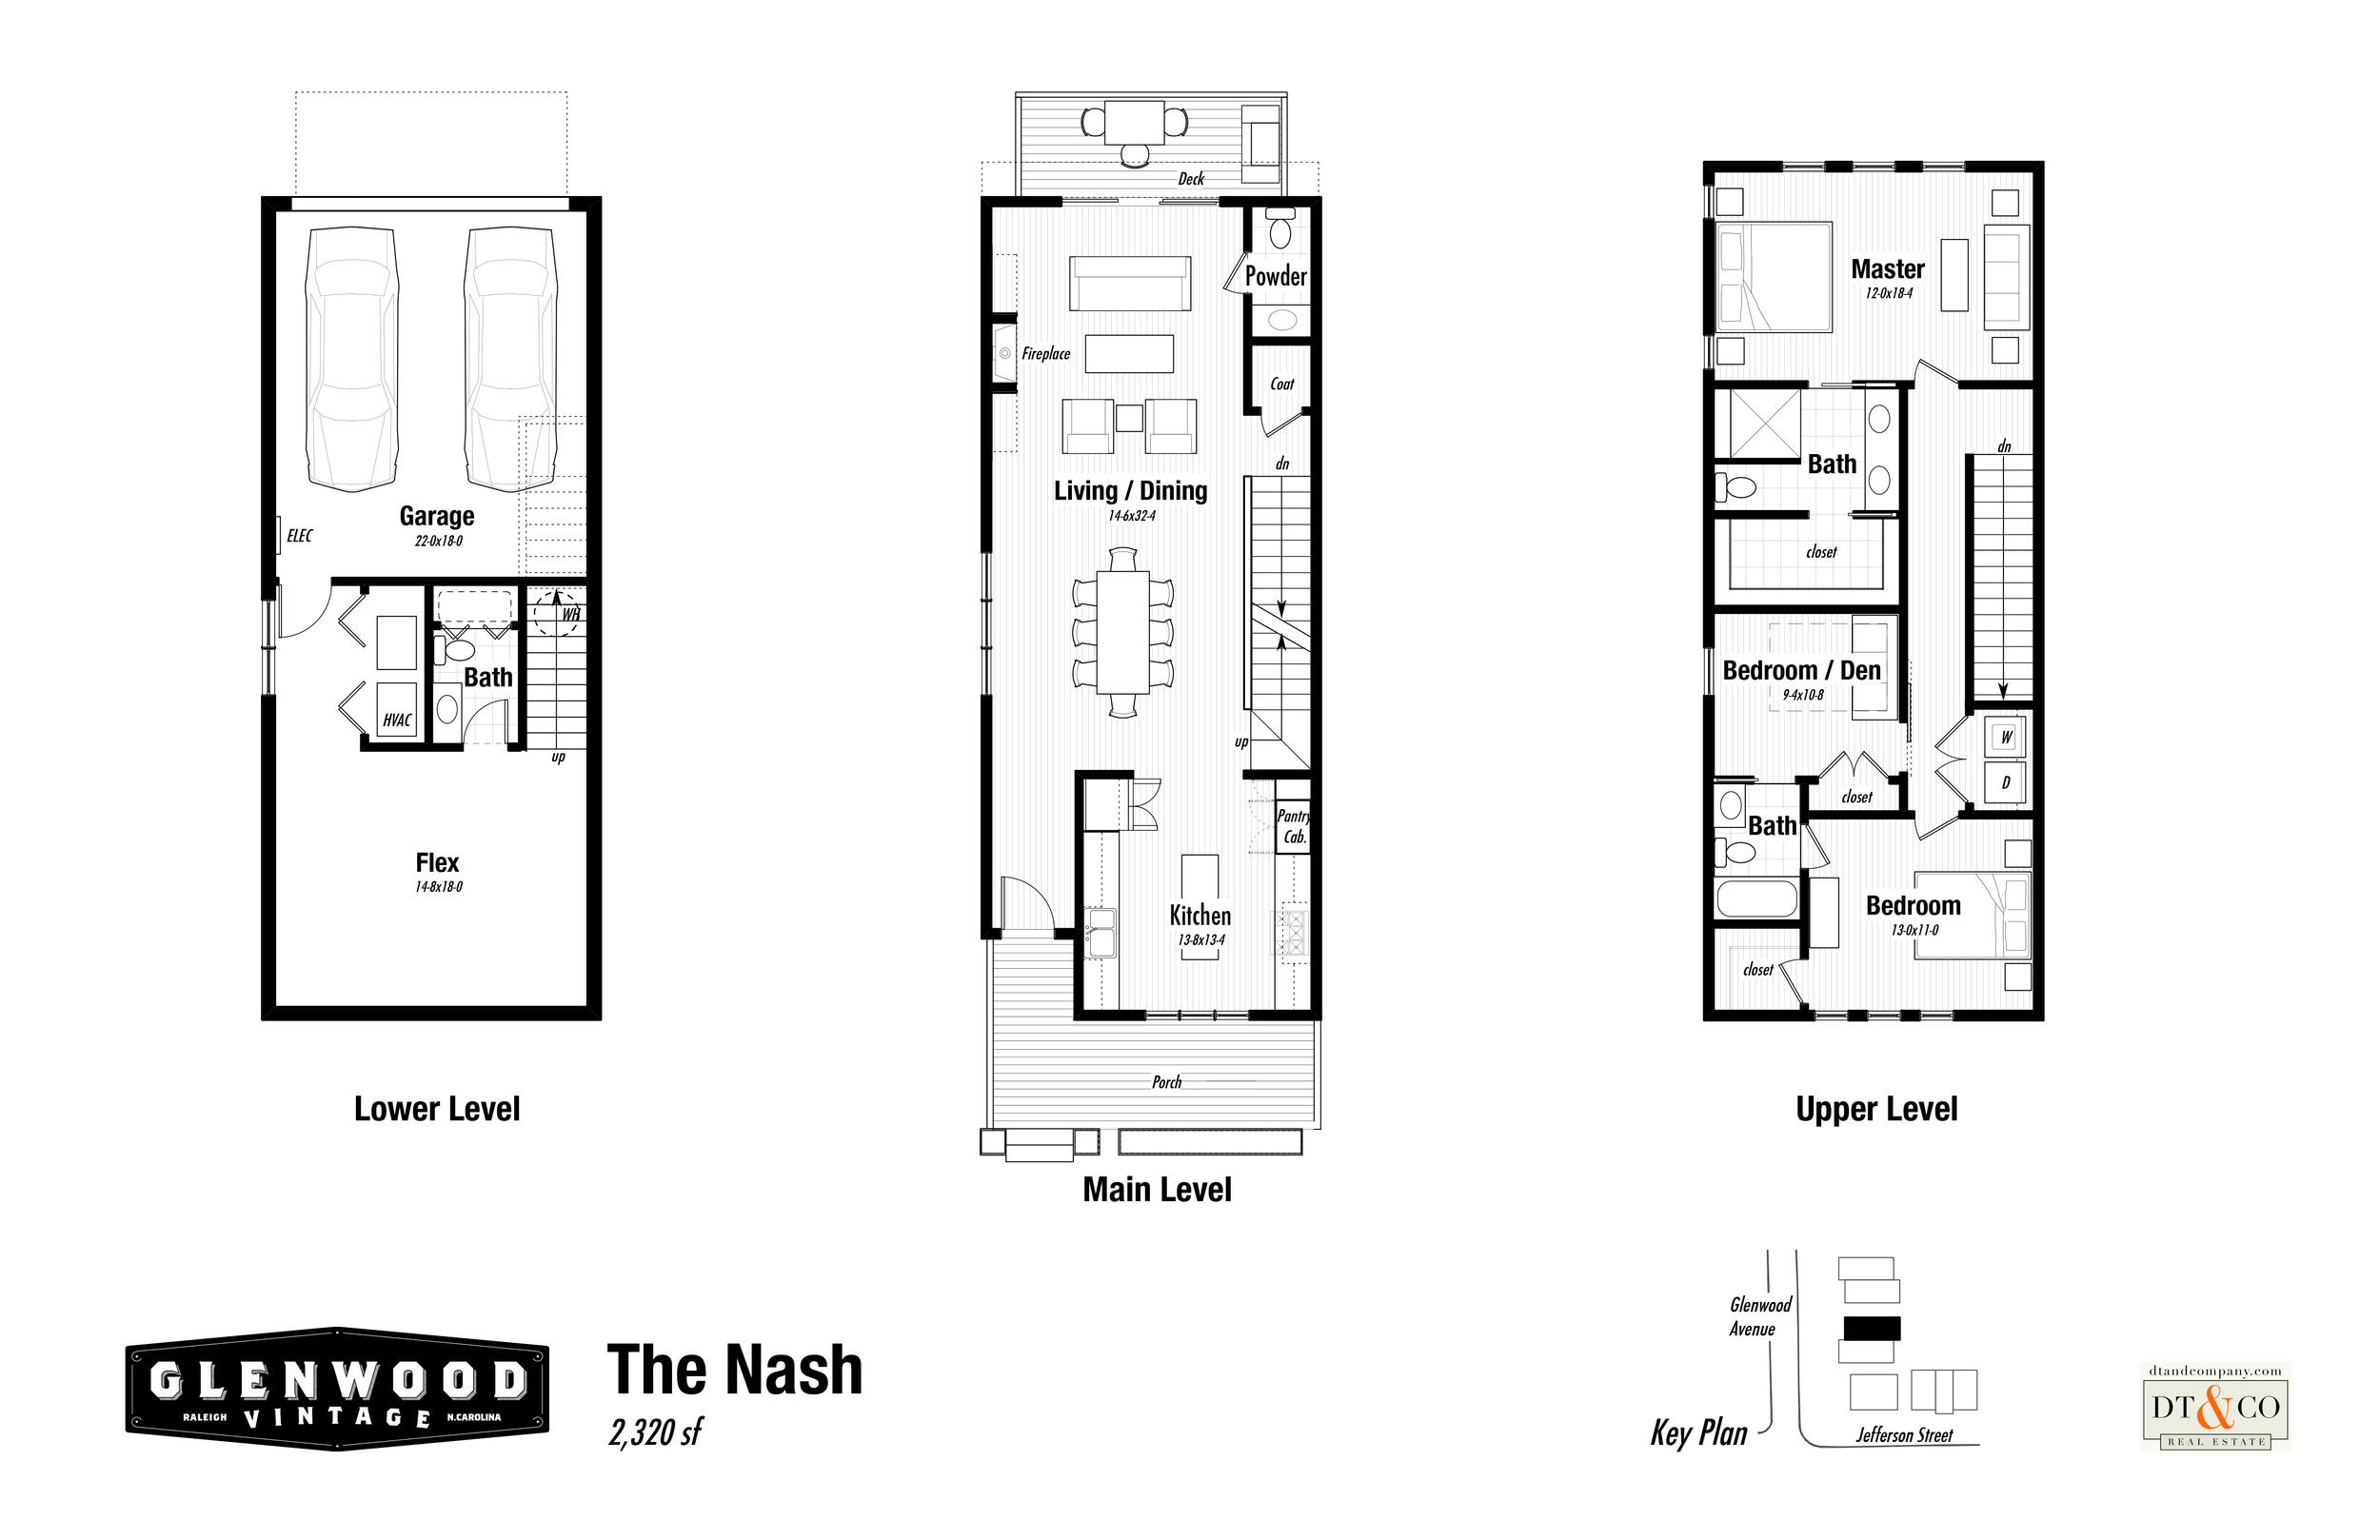 Nash_Mktg_Plan2.jpg